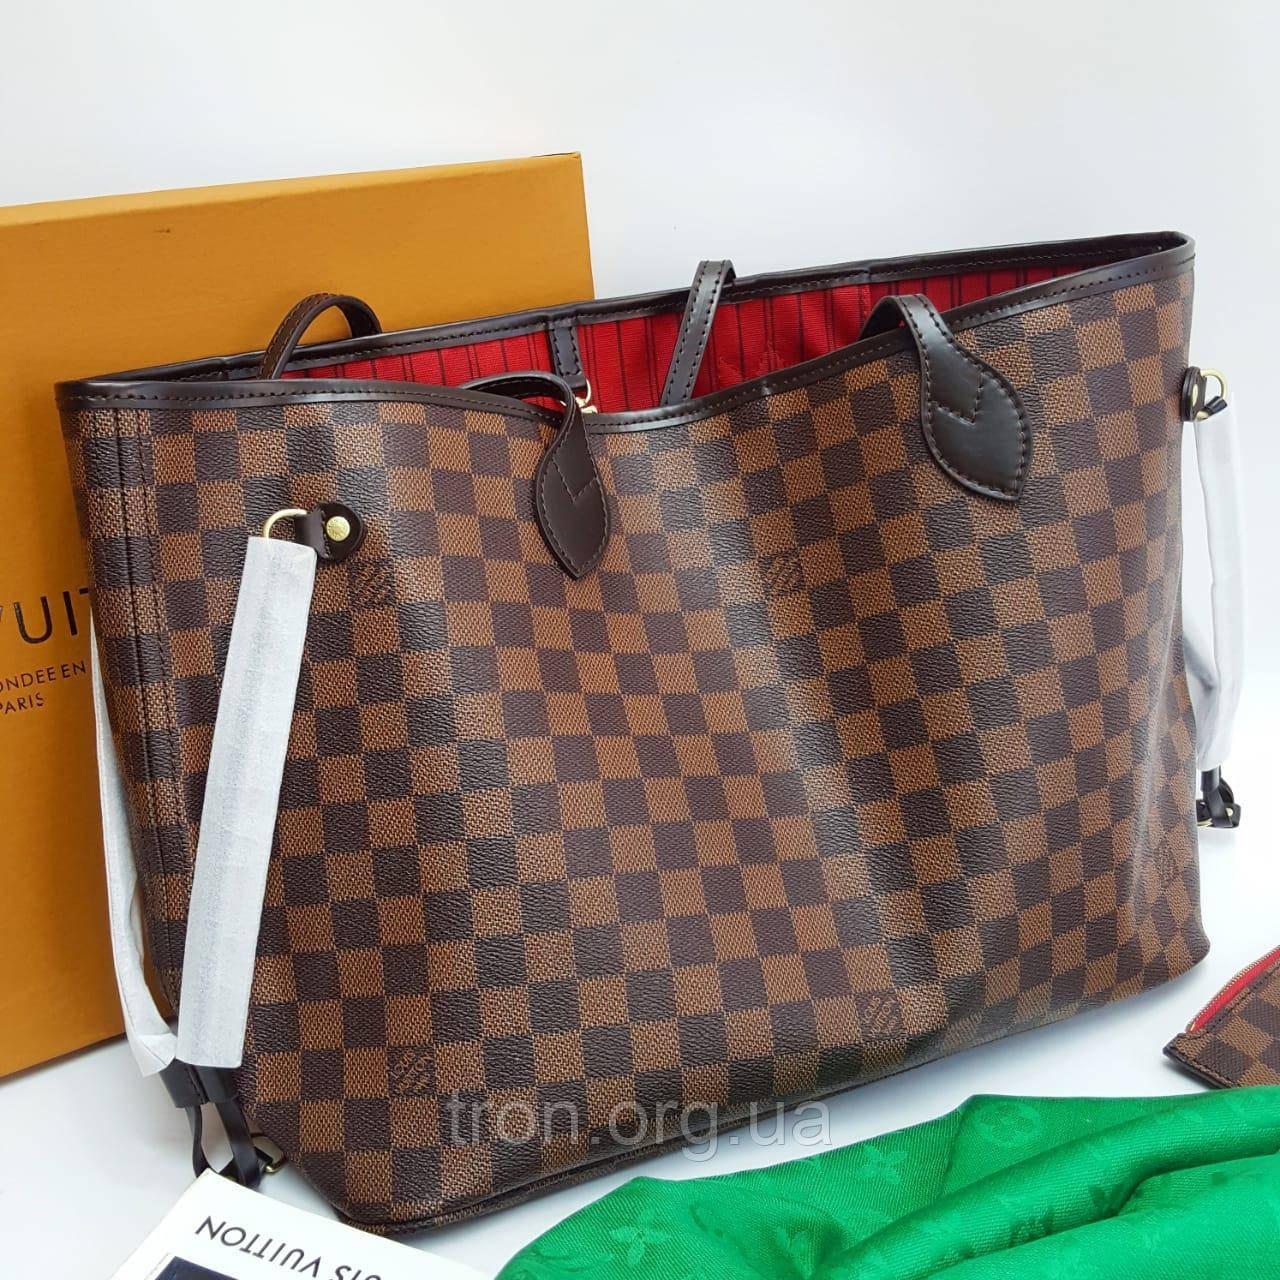 3e7f85ac1913 Сумка Женская Louis Vuitton Neverfull: продажа, цена в Харькове ...